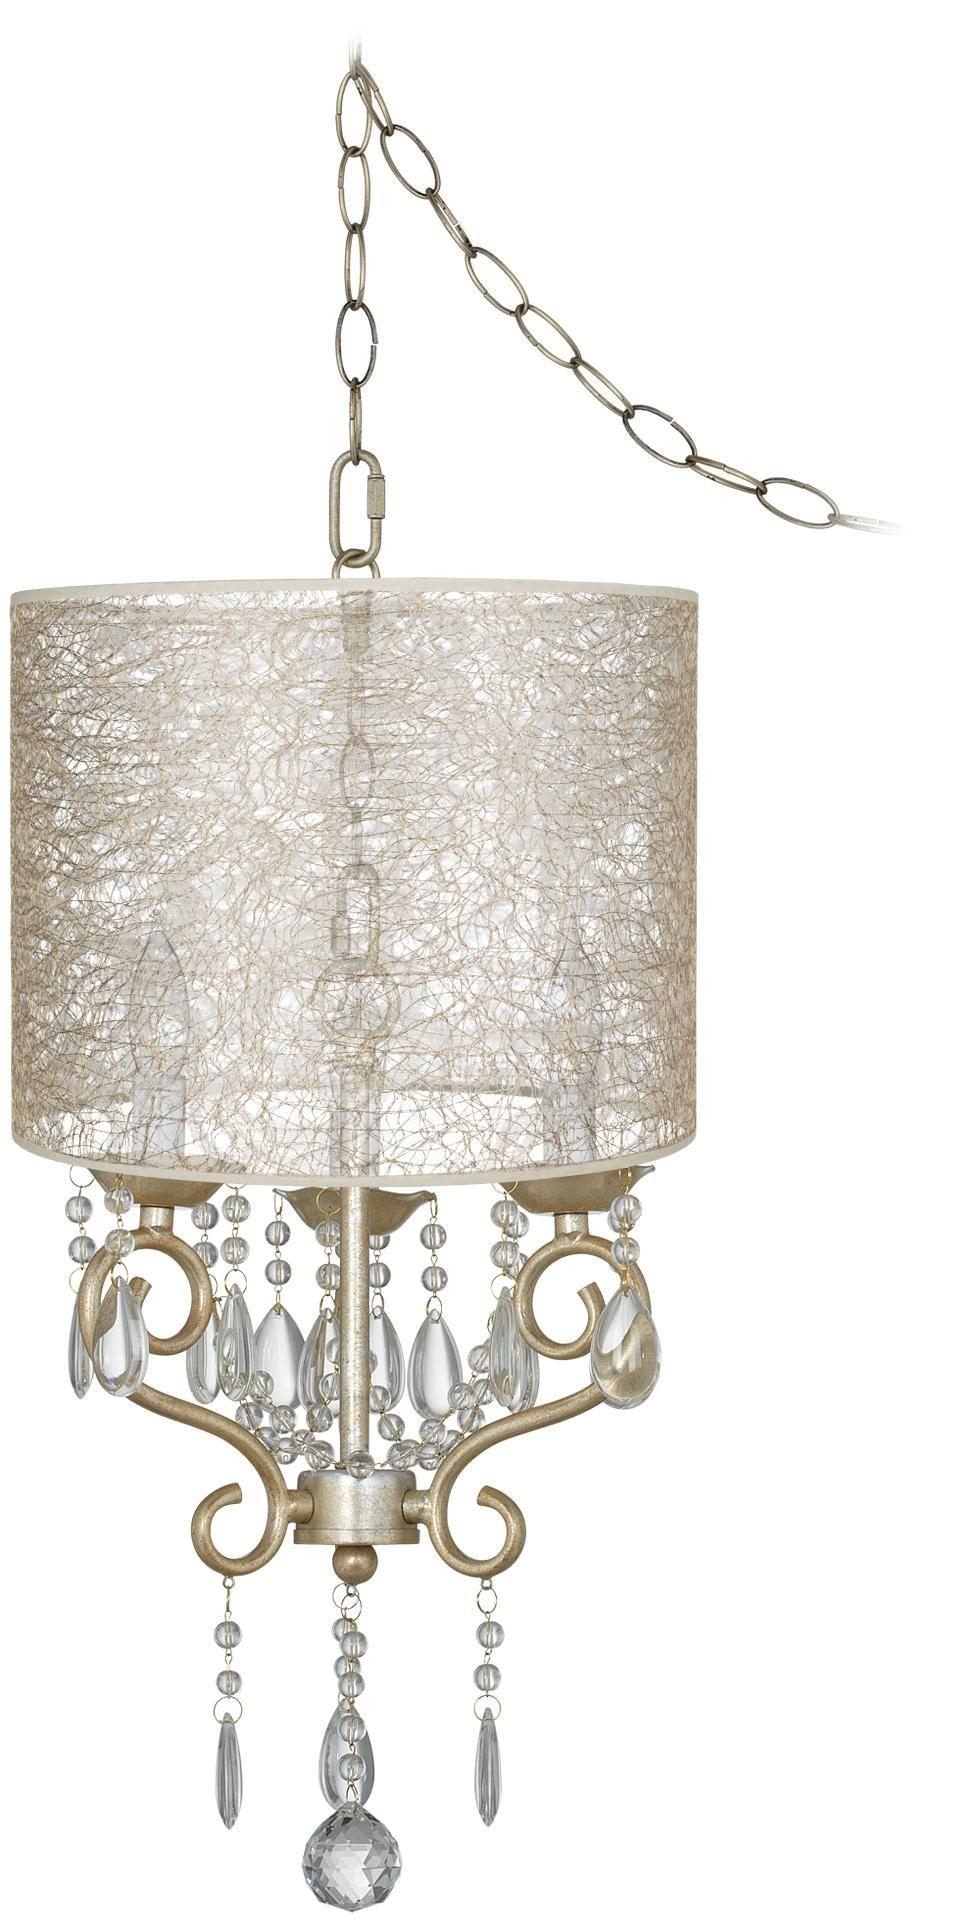 Conti 14 wide transparent fiber shade mini swag chandelier home conti 14 wide transparent fiber shade mini swag chandelier aloadofball Images